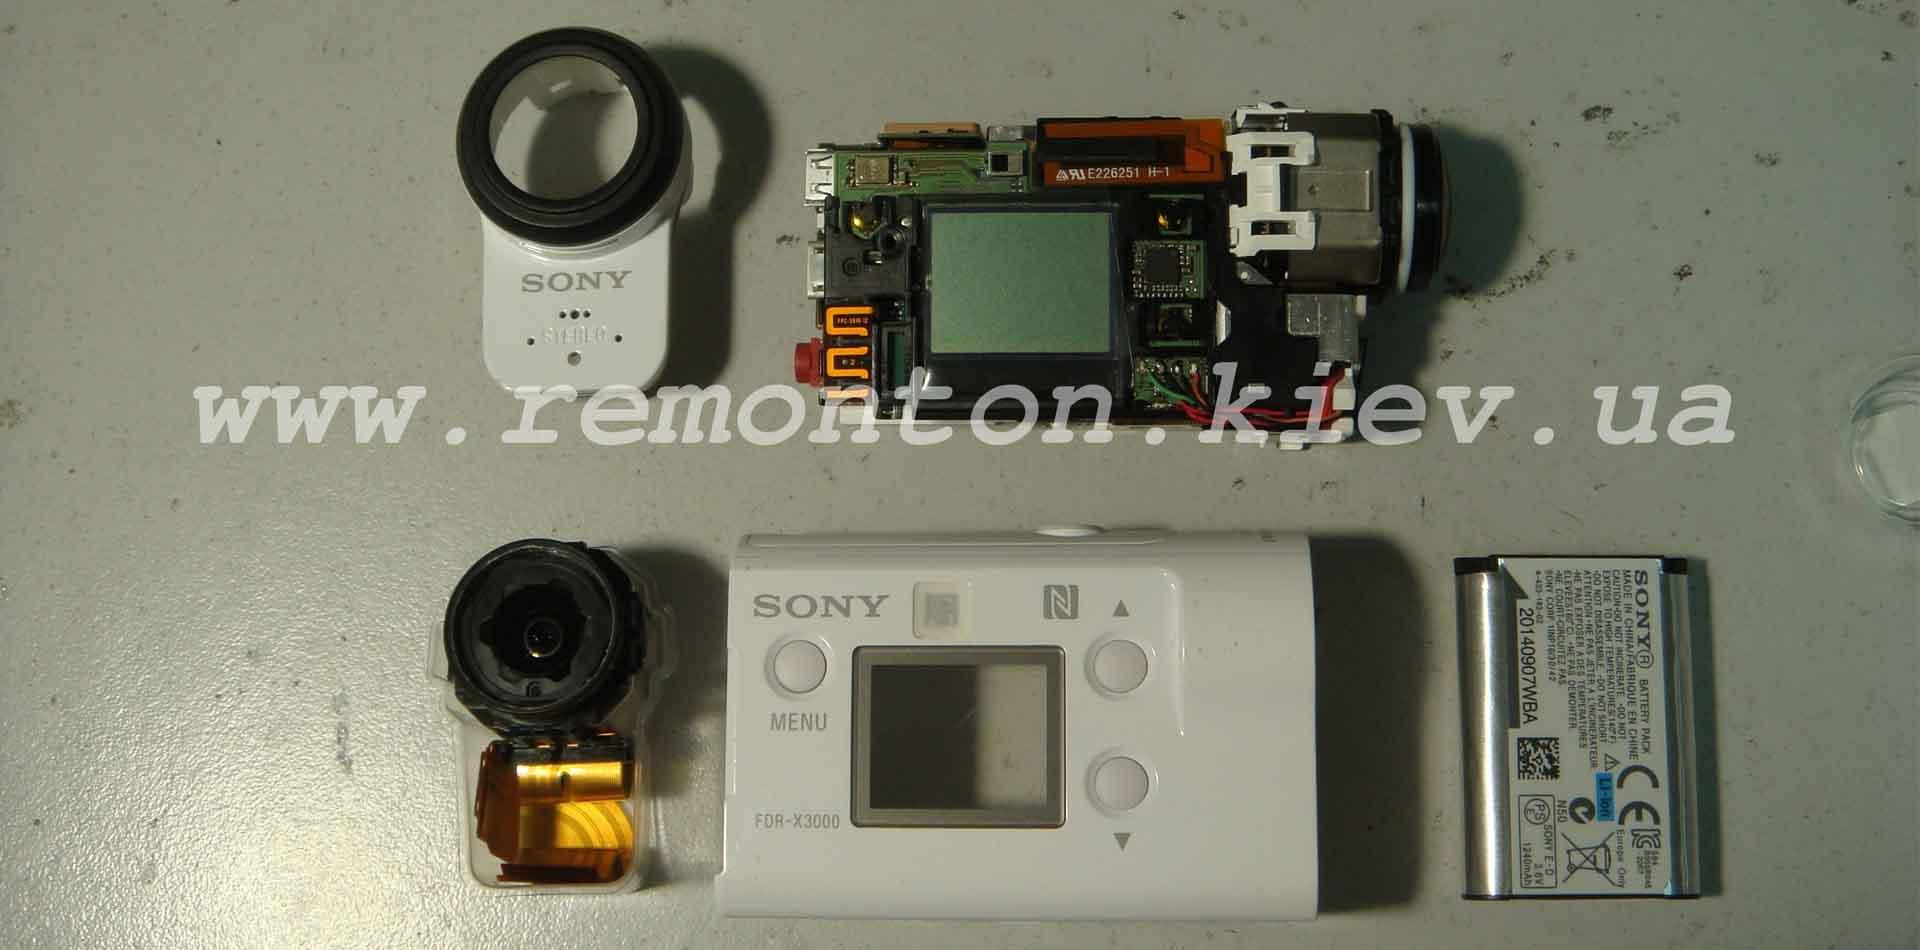 Замена объектива экшн камеры Sony FDR-X3000